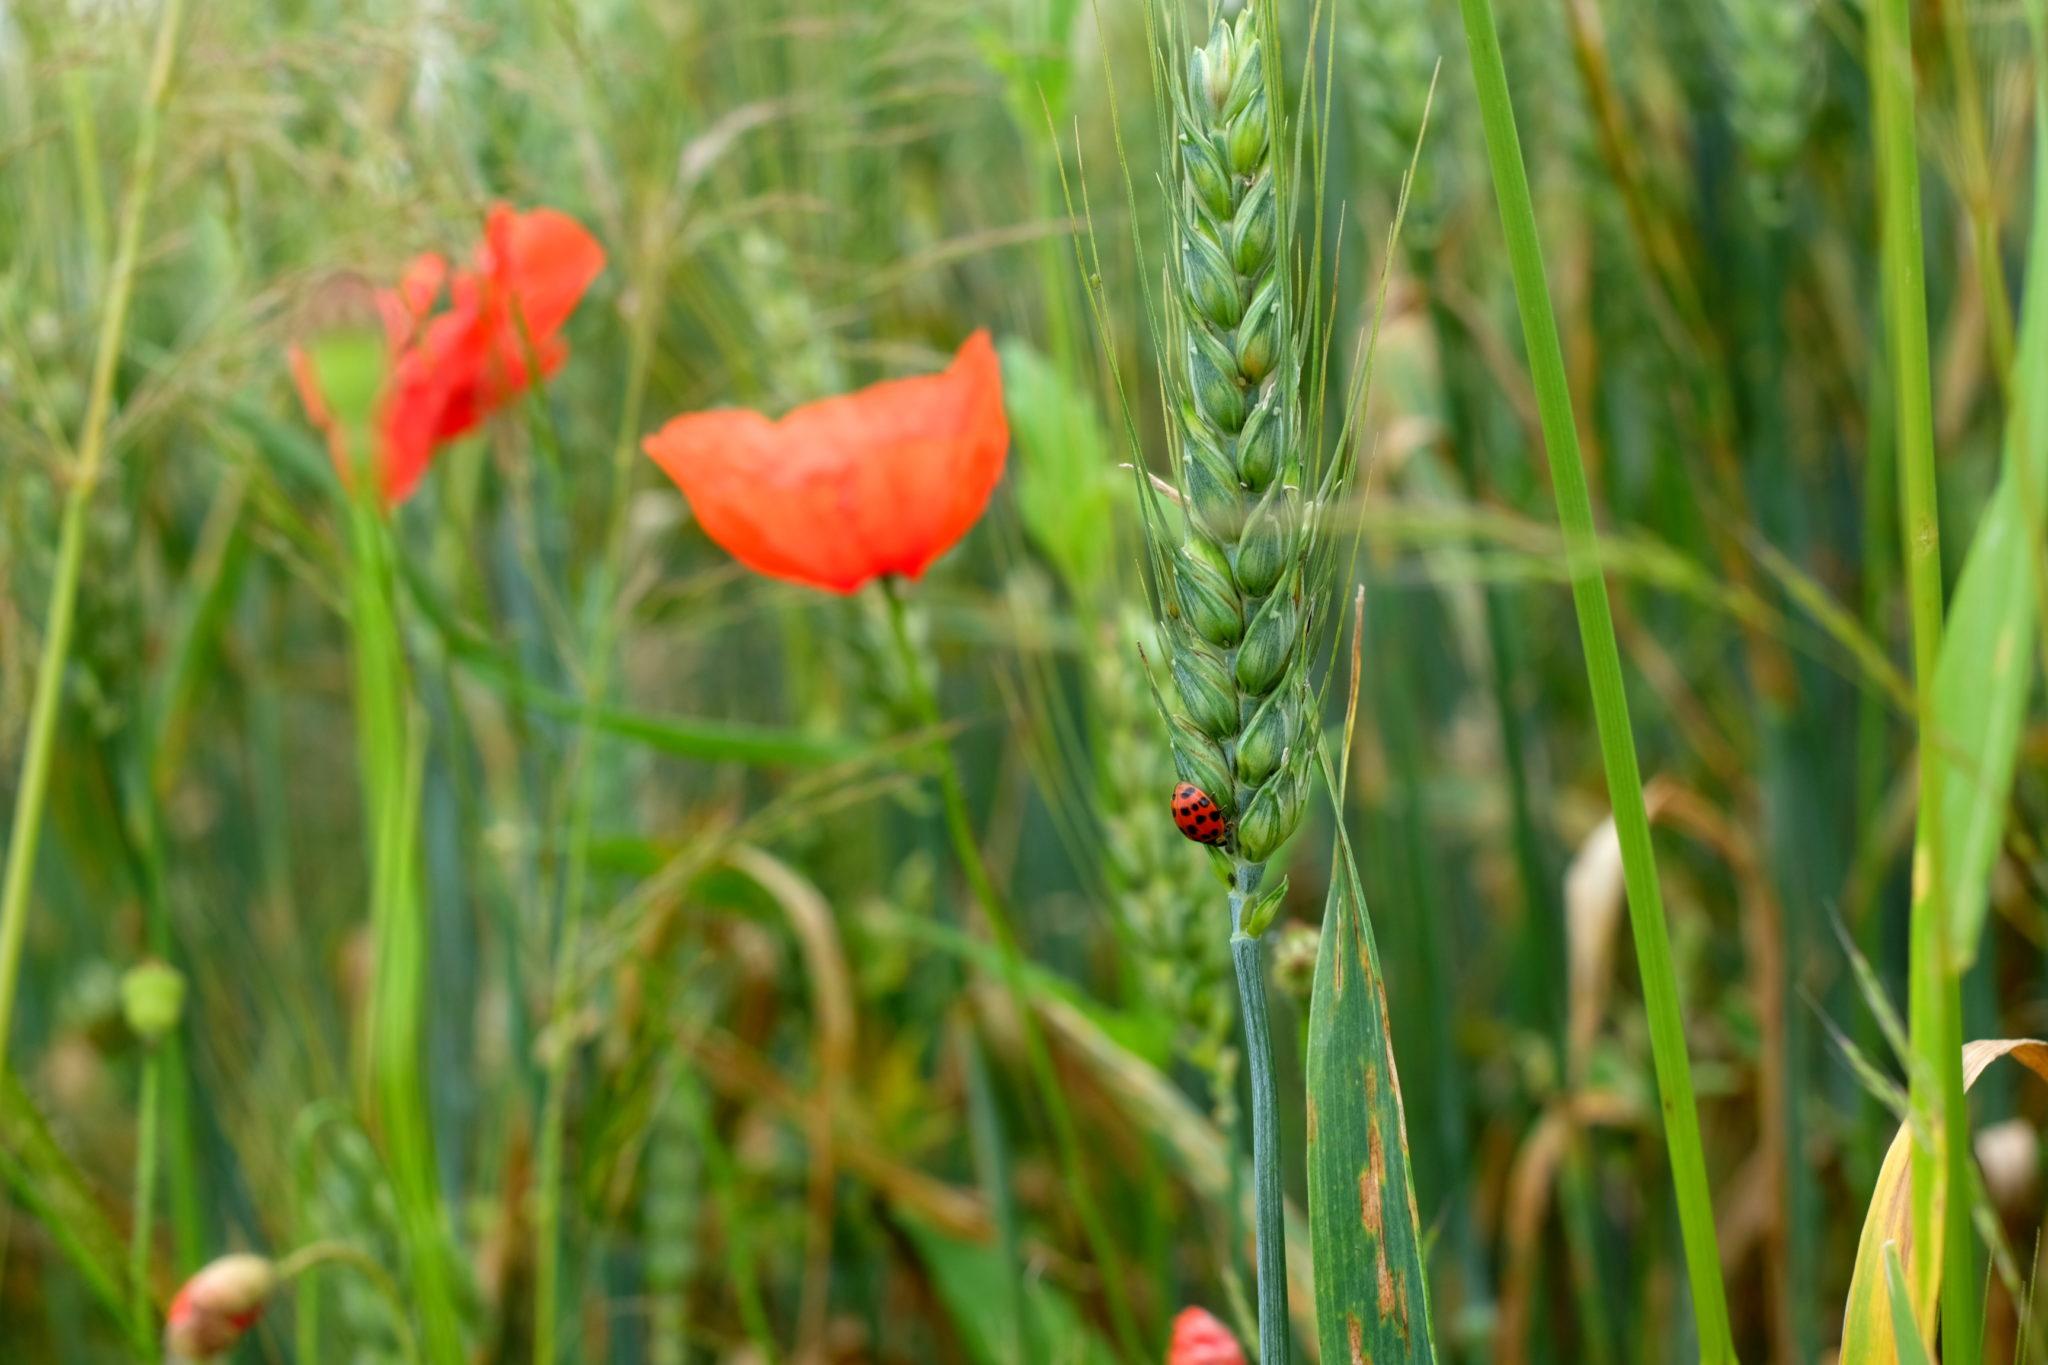 A ladybug hidden among red flowers.